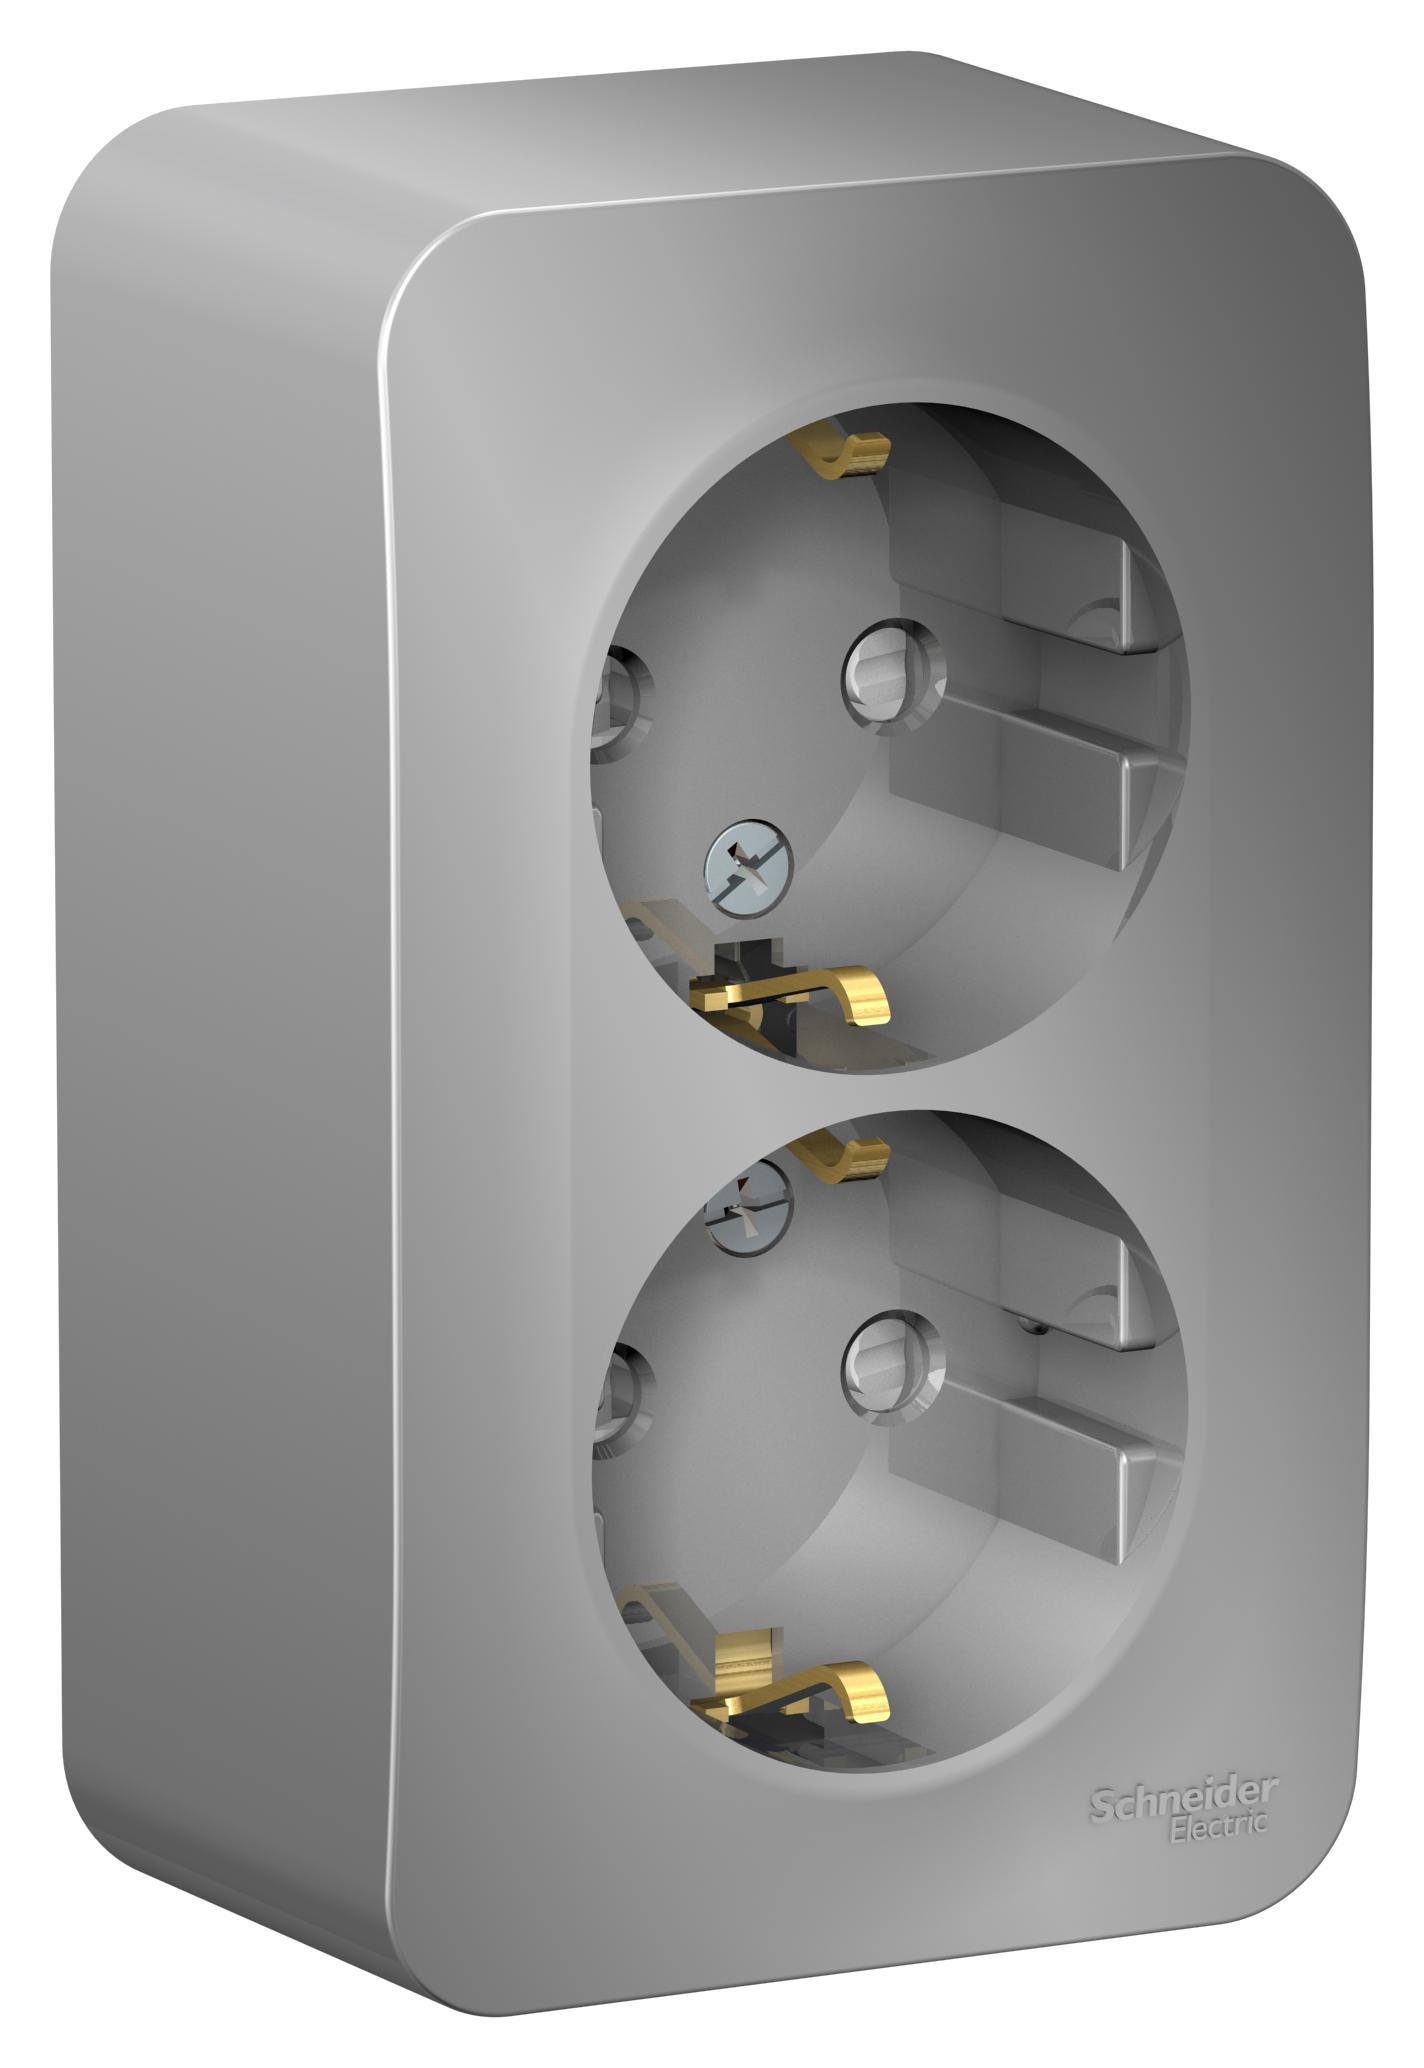 Купить Розетка Schneider electric Blnra011203 blanca